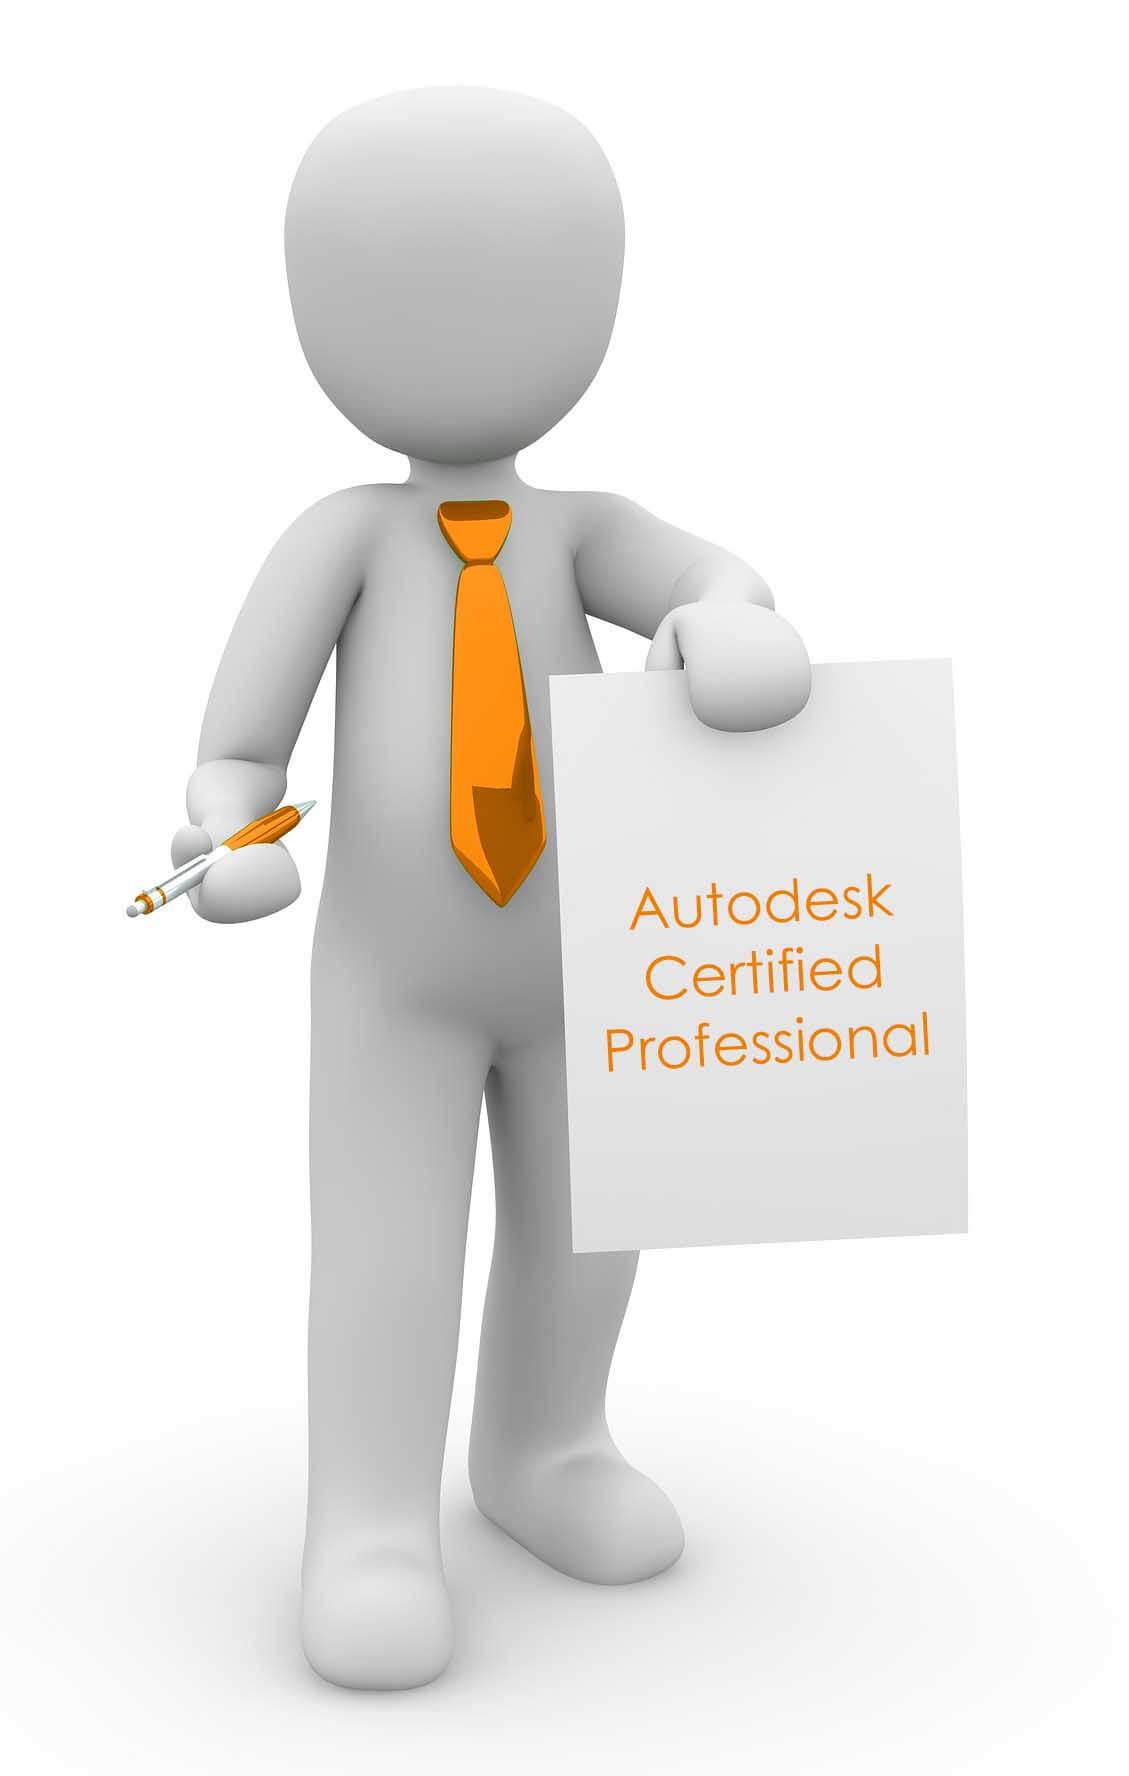 Consigue Certificado Profesional de Autodesk